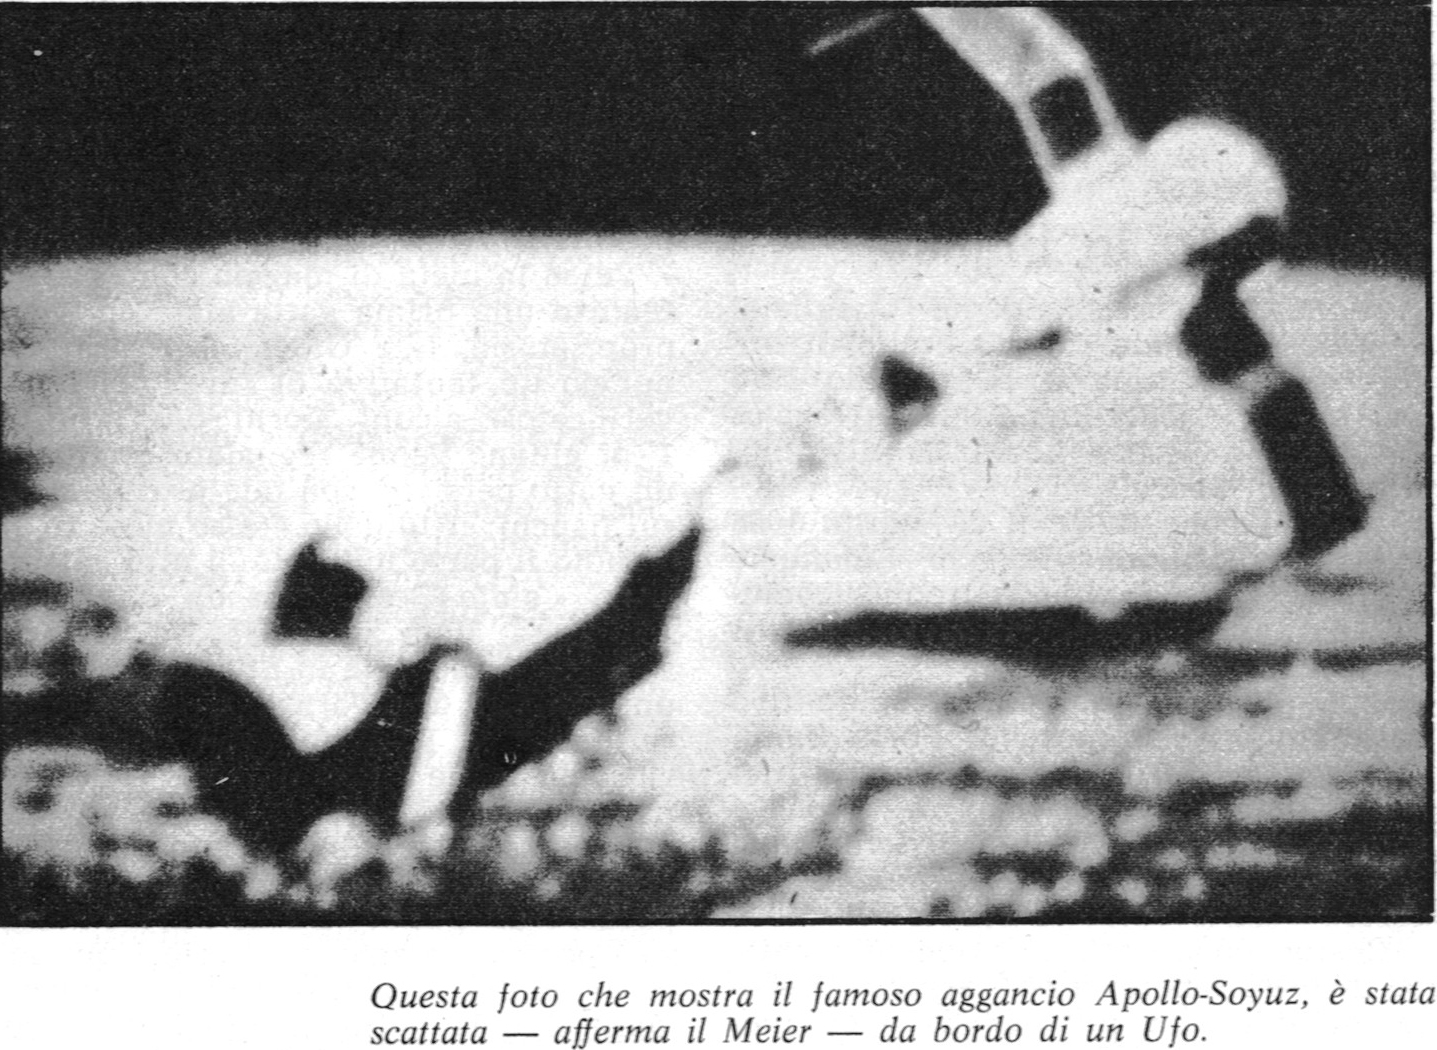 IL GIORNALE DEI MISTERI (August 1976) by Ilse Von Jacobi